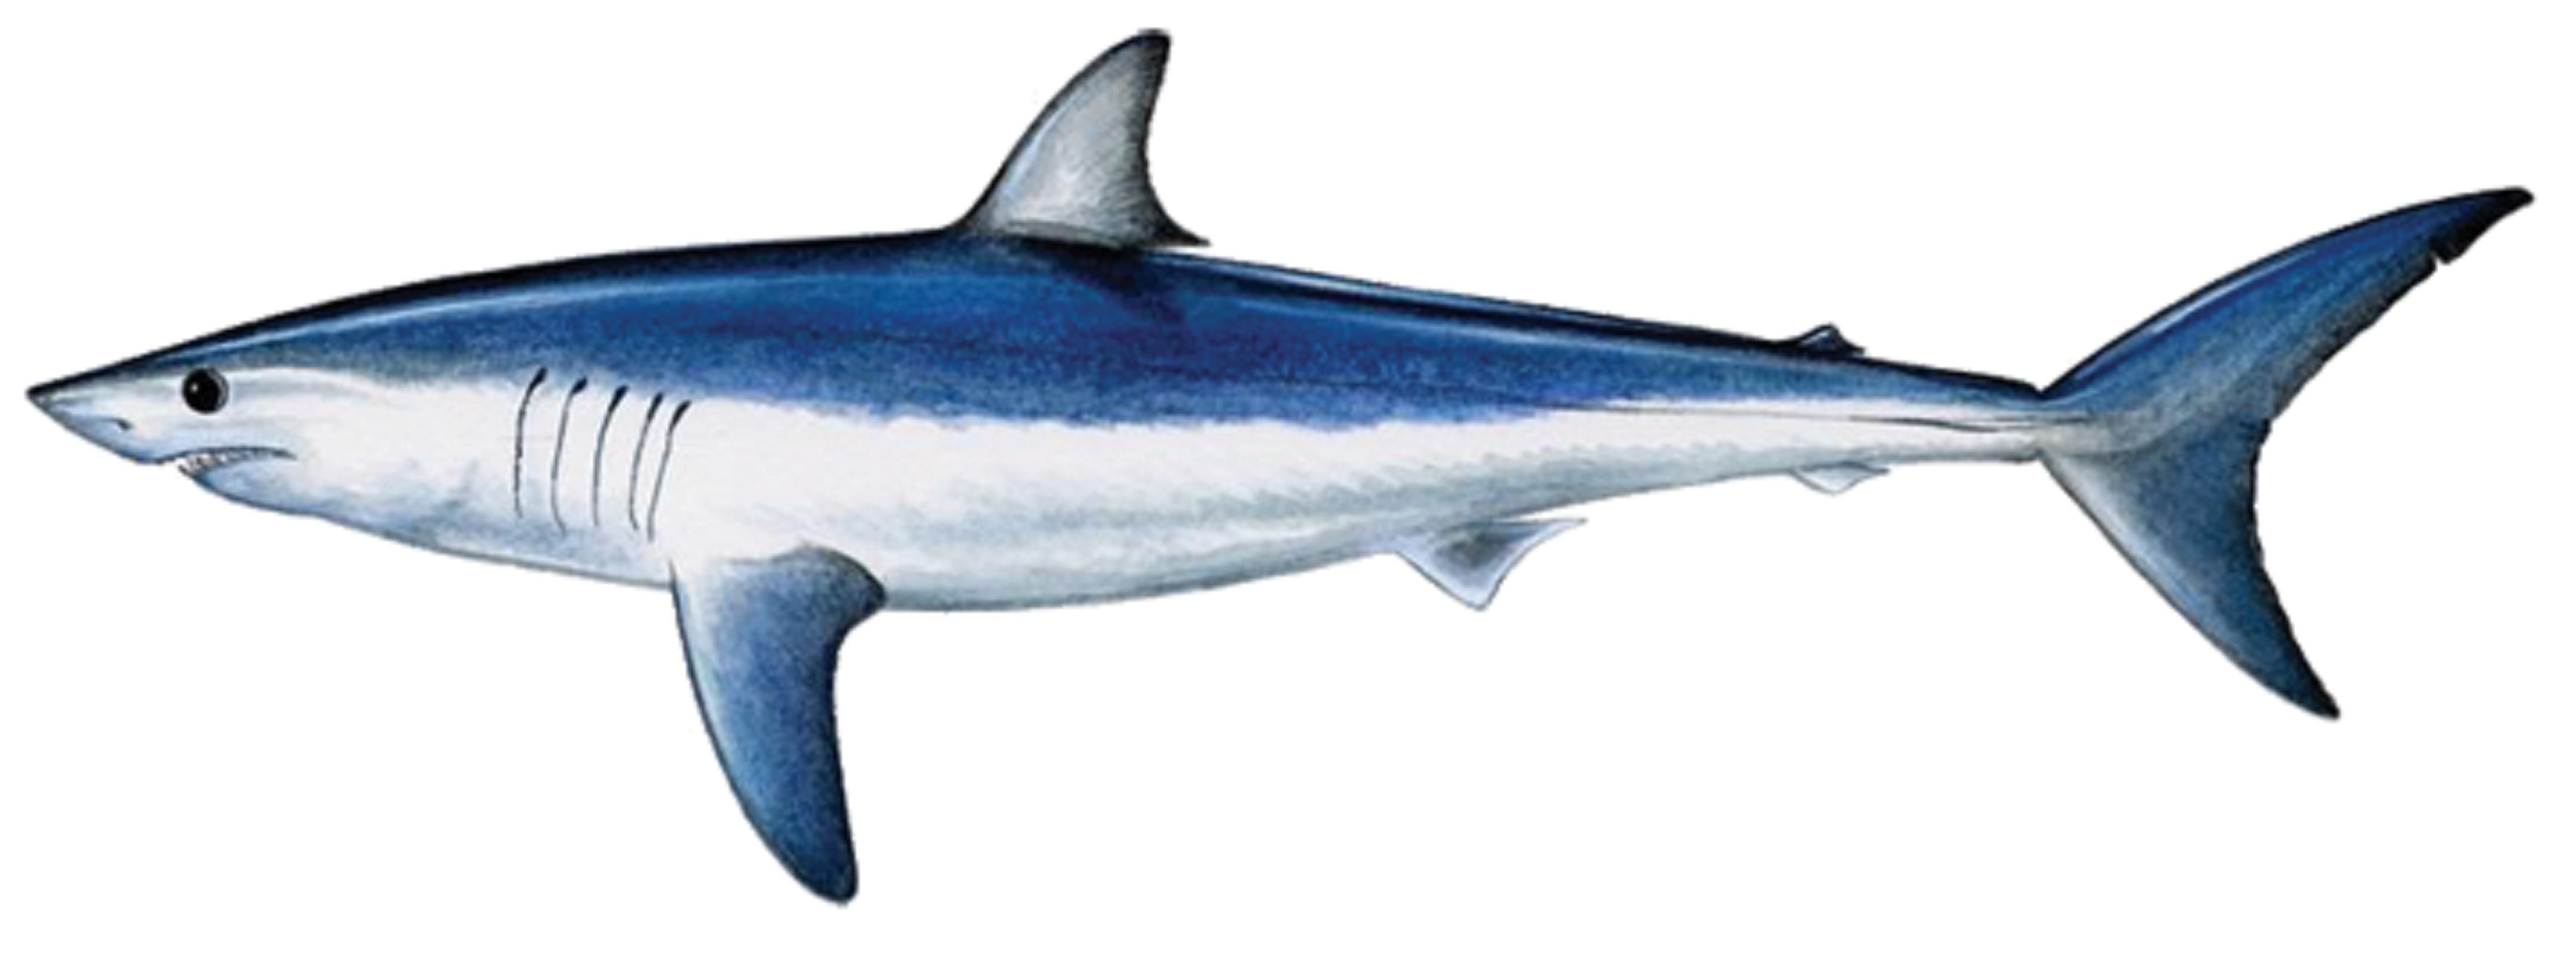 Mako Shark Clipart at GetDrawings.com.